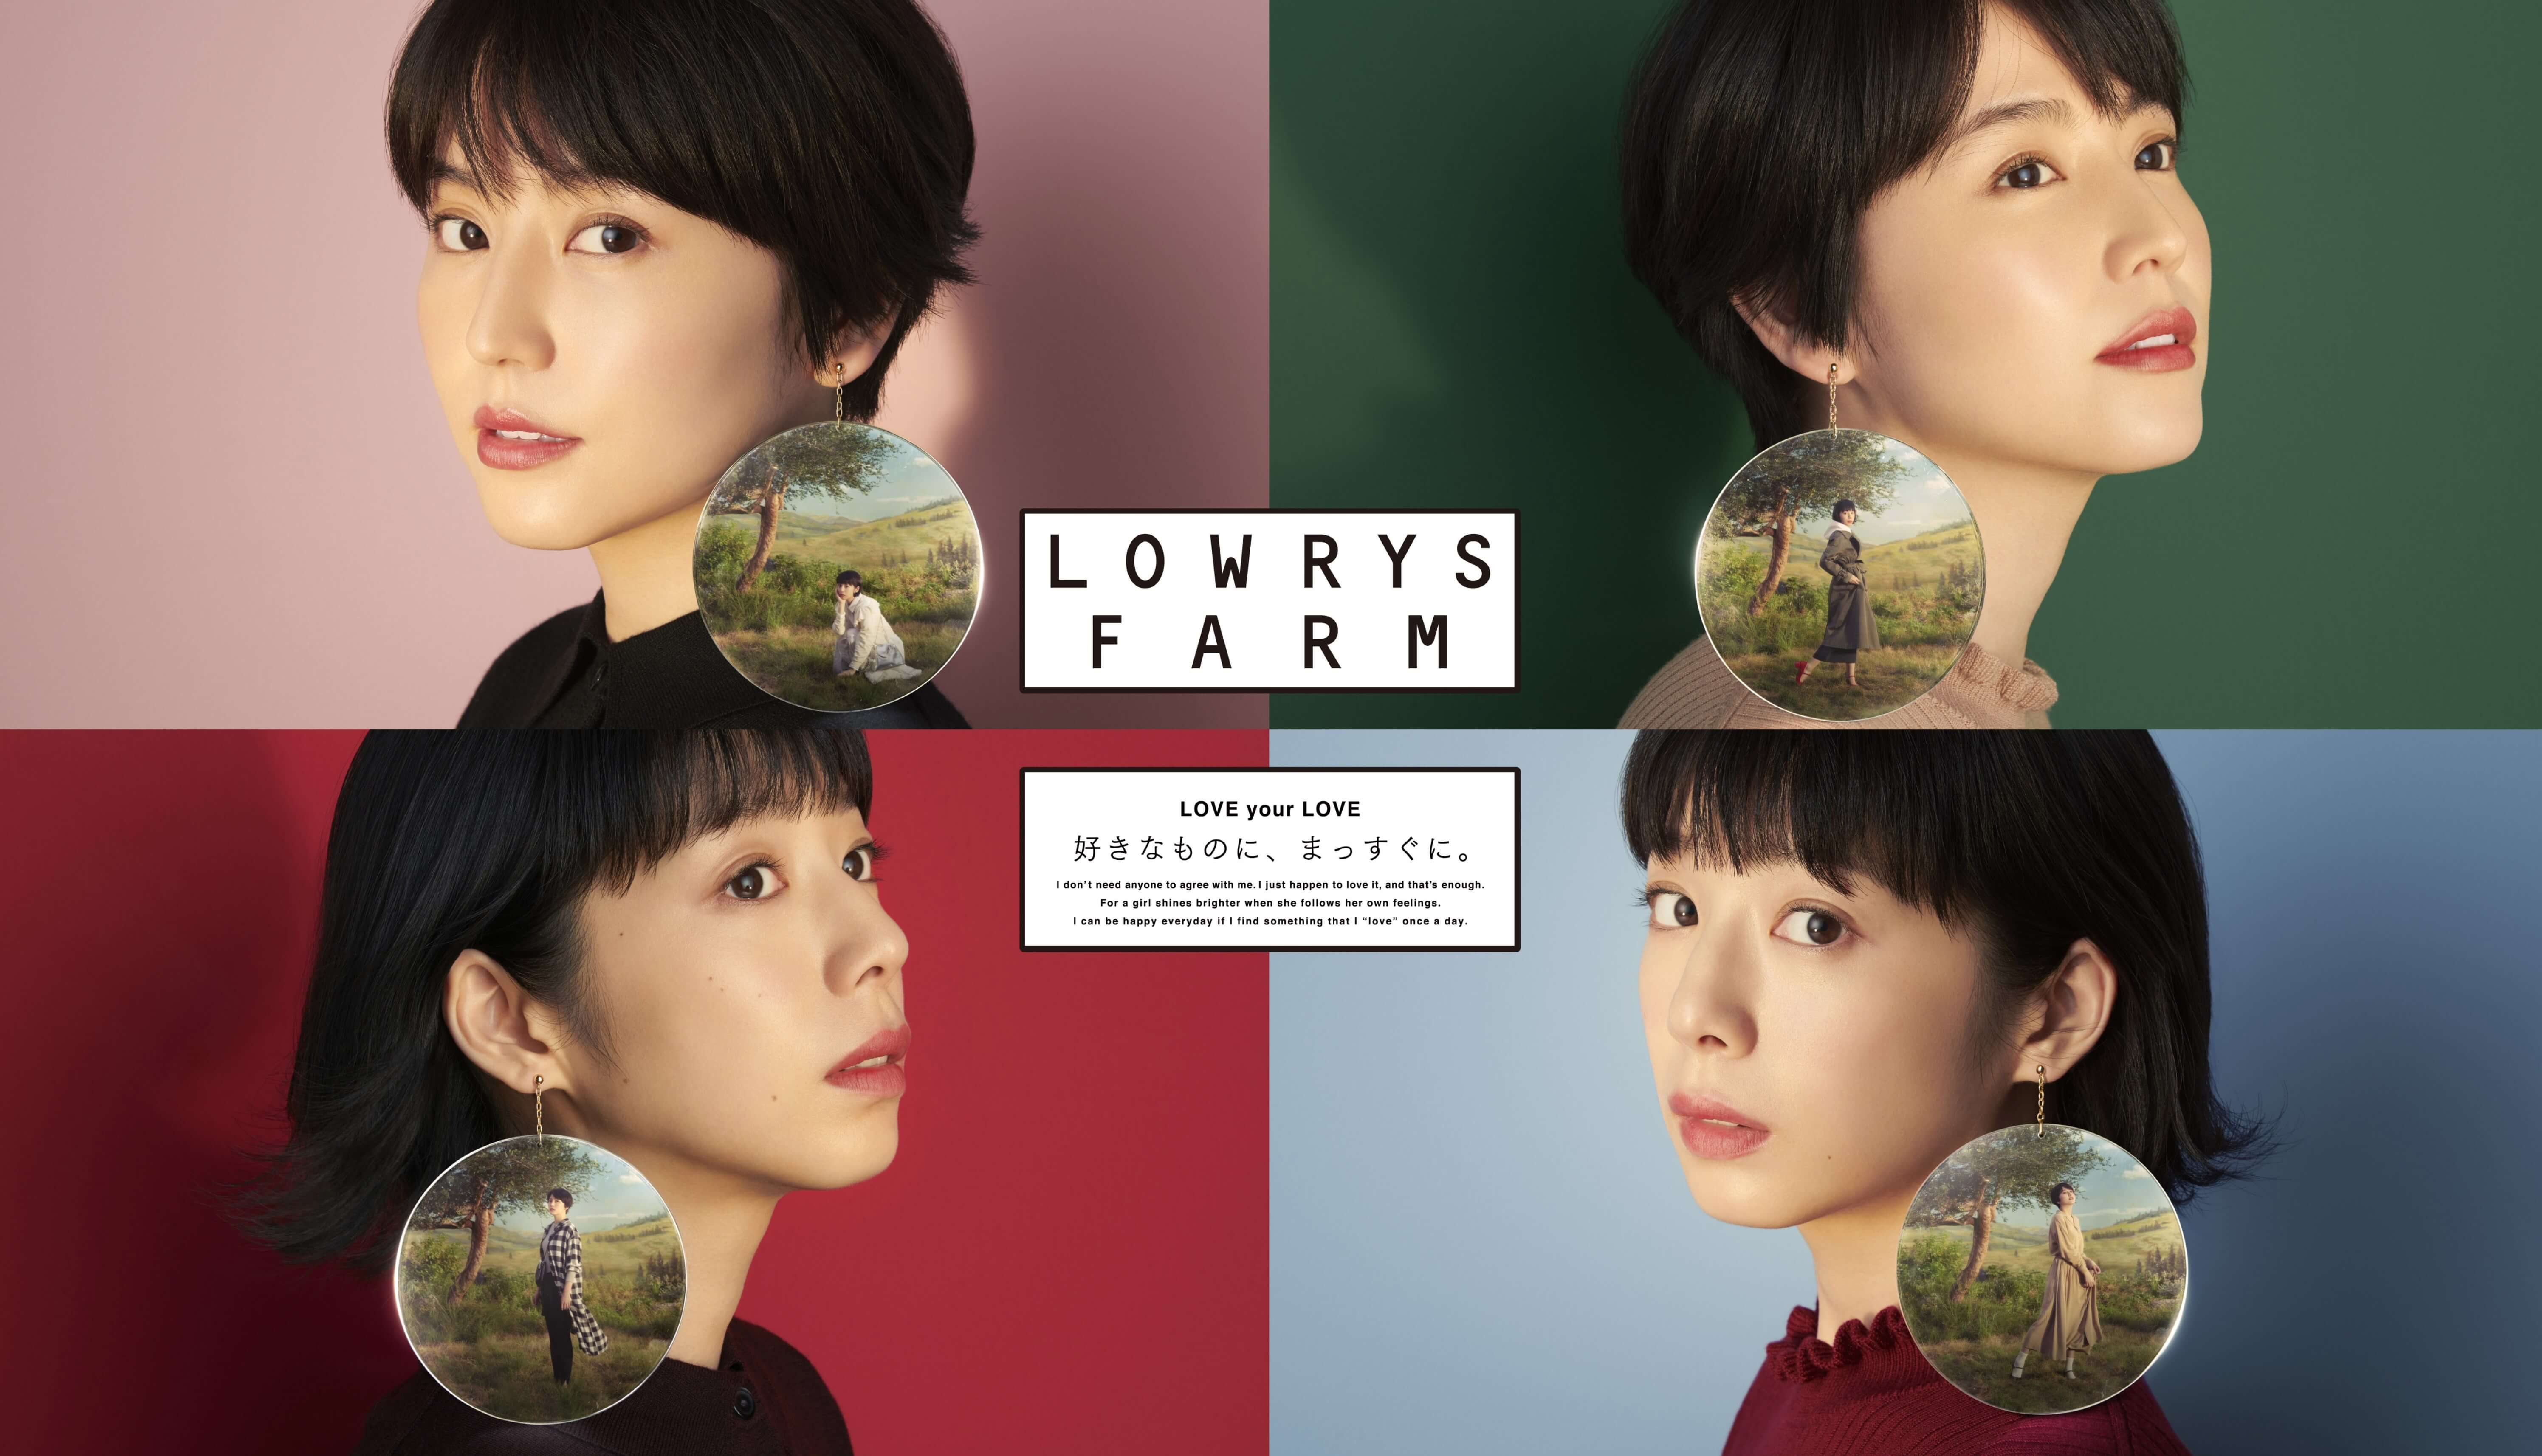 LOWRYS FARM 2018A/W代言人決定起用長澤雅美・夏帆! 日本文化、日本流行、觀光、日本飲食